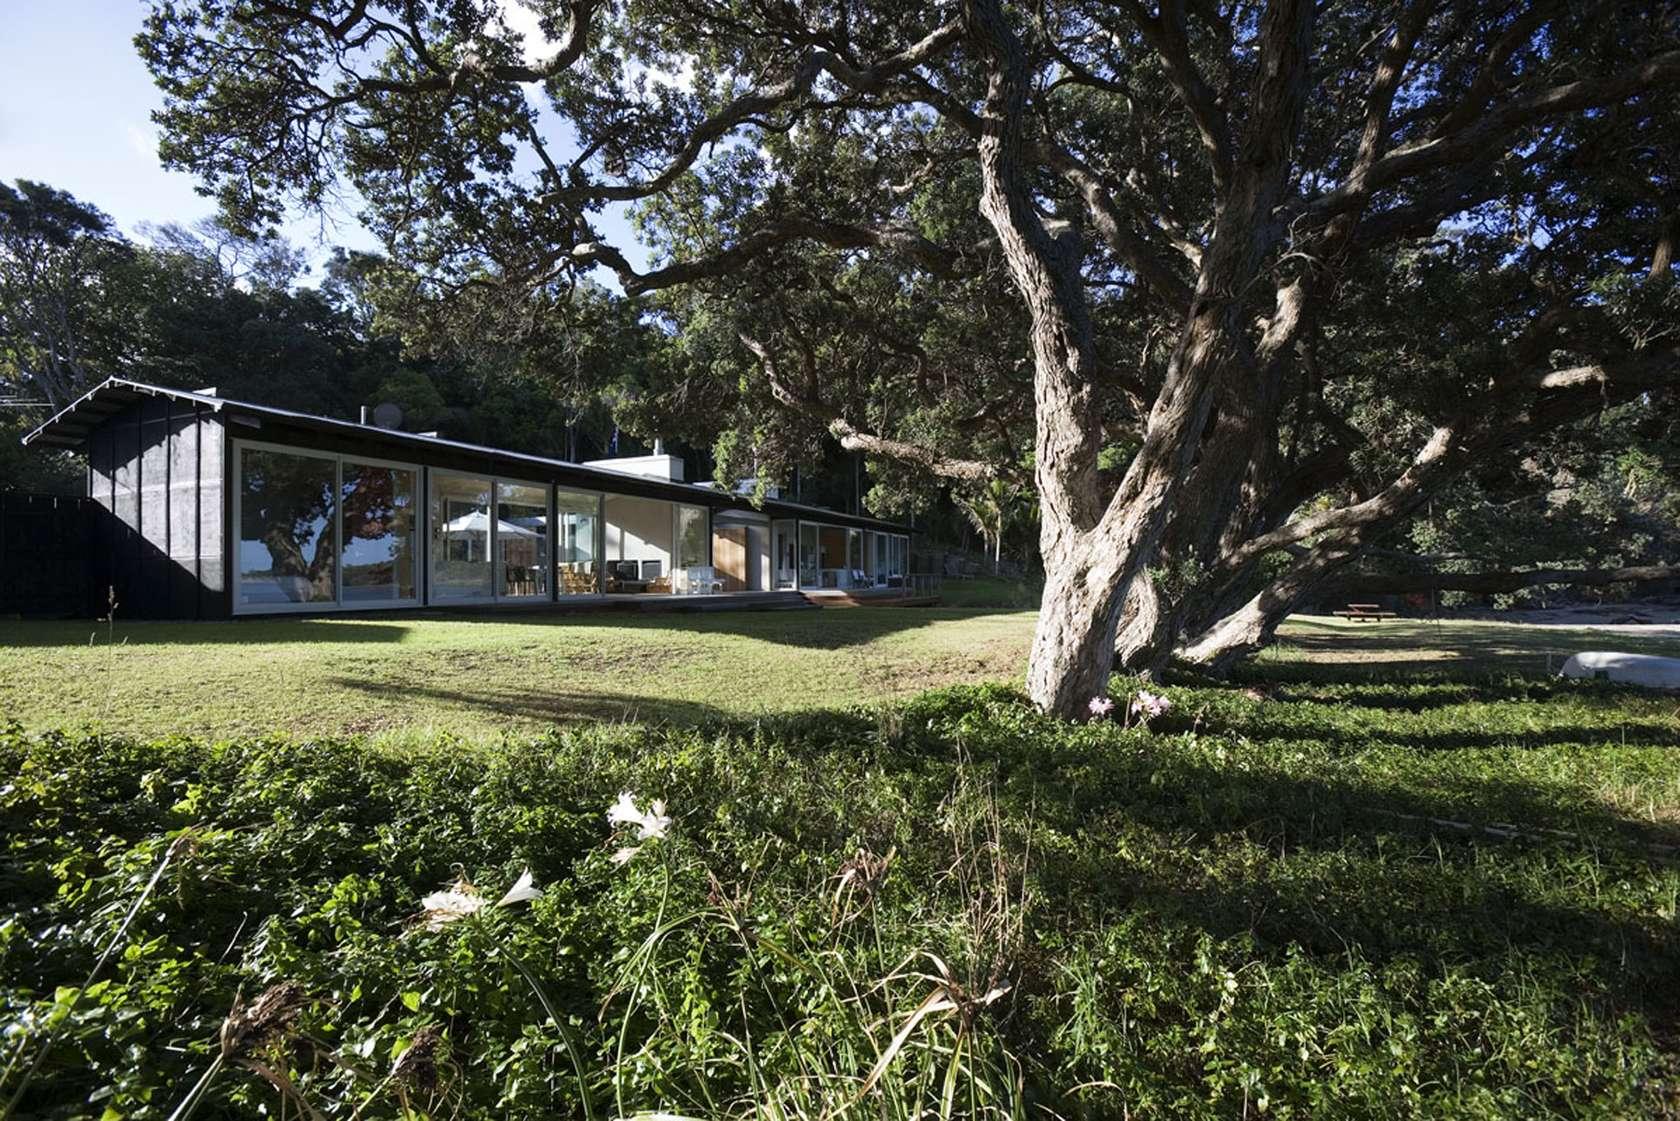 Tawharanui House by RTA Studio (via Lunchbox Architect)